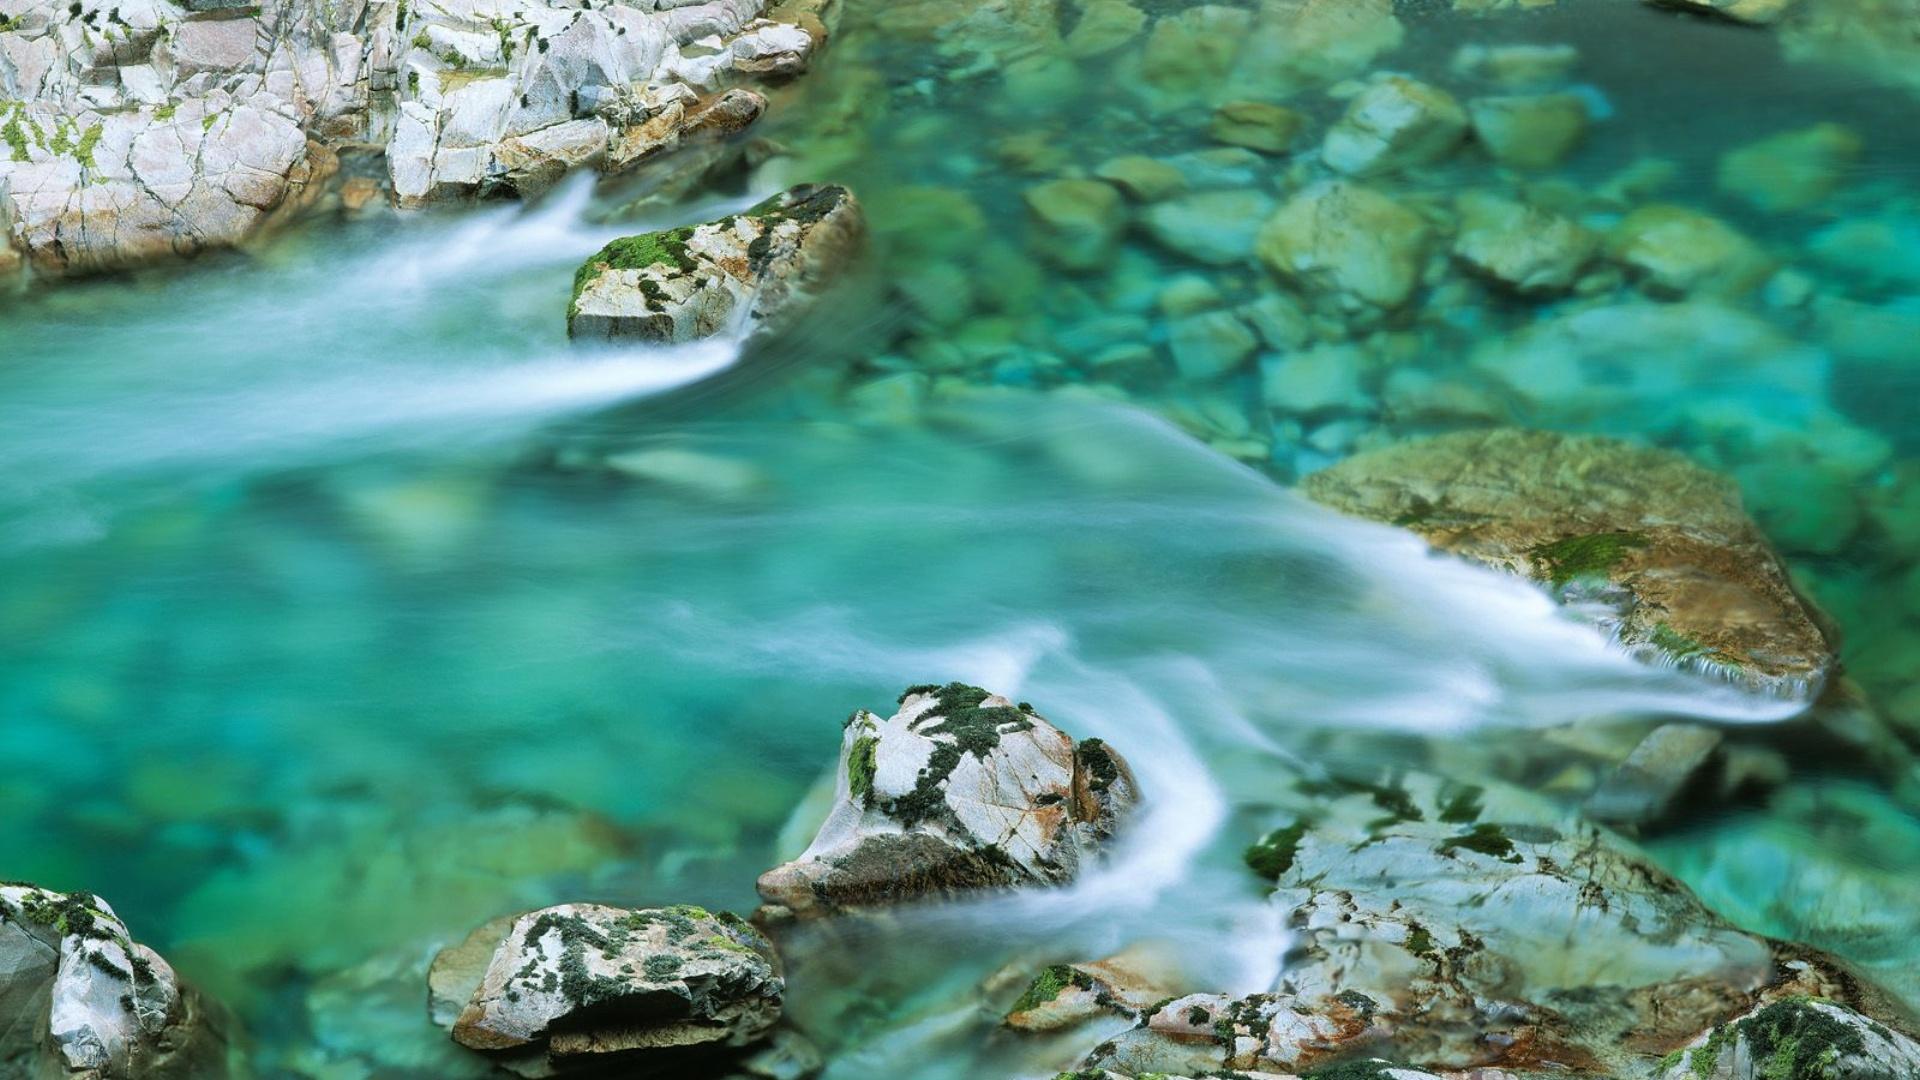 Sfondo hd natura acqua sfondi hd gratis for Sfondi hd natura